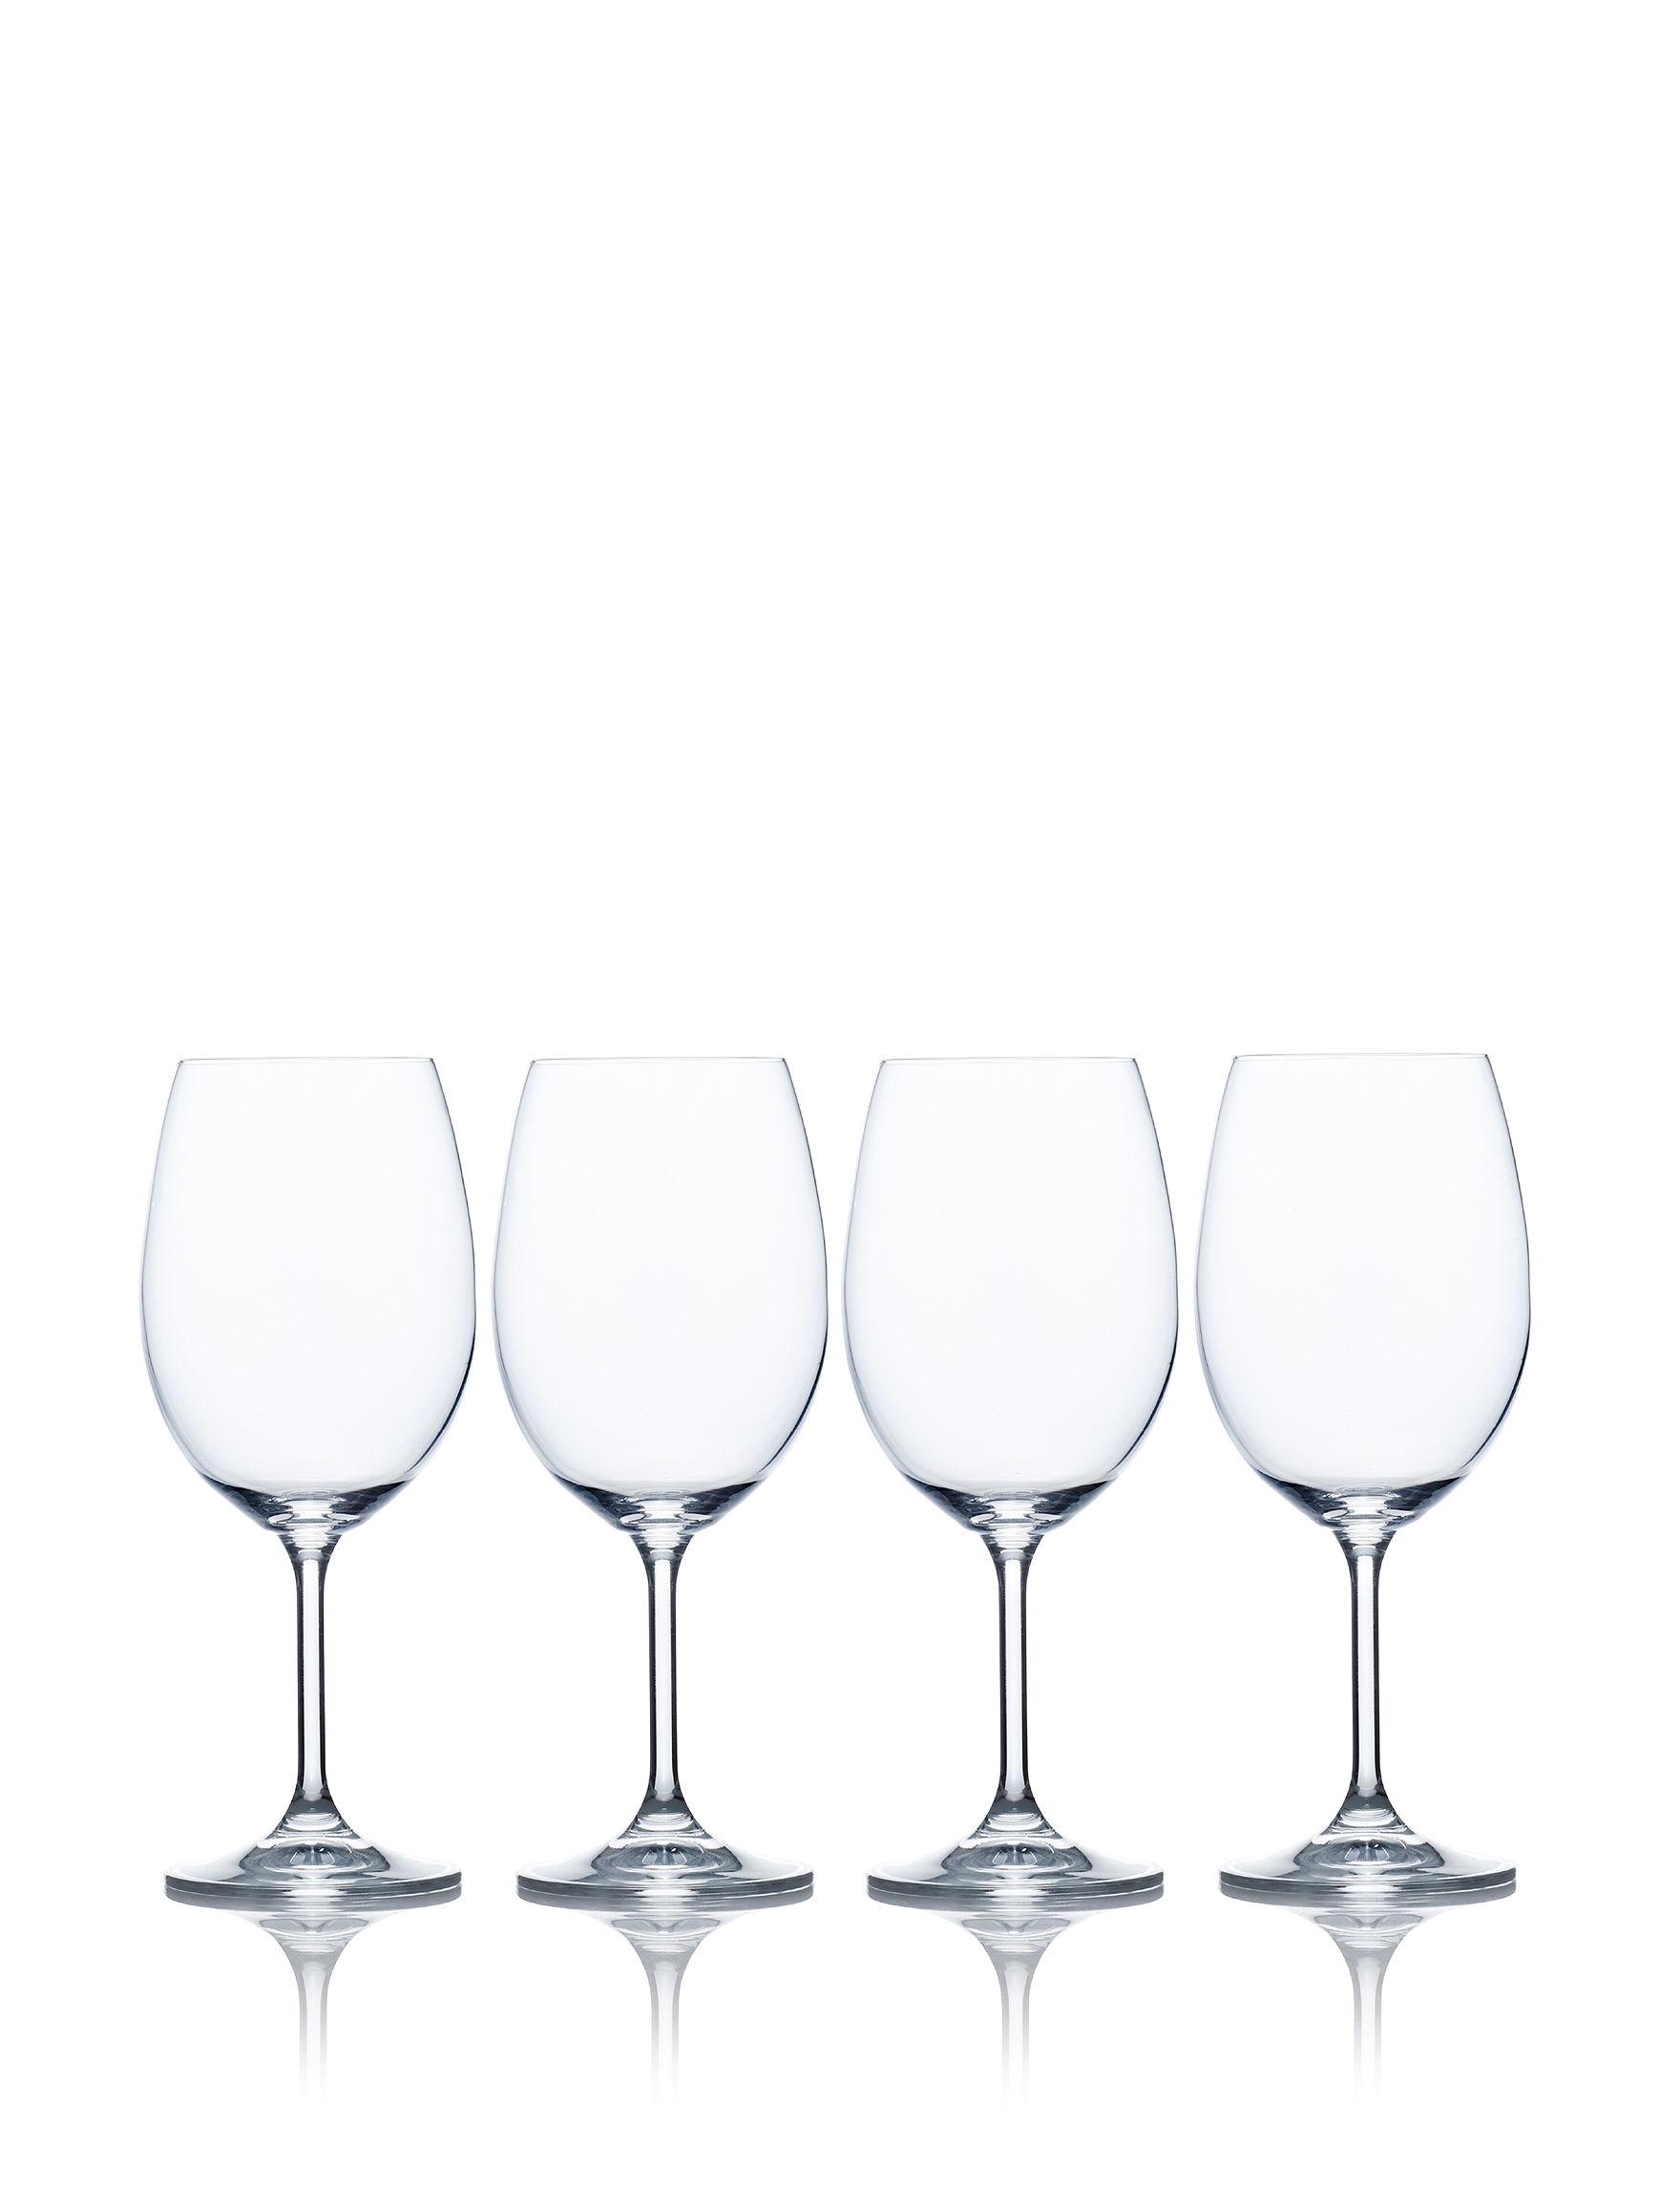 Mikasa Clear Wine Glasses Drinkware